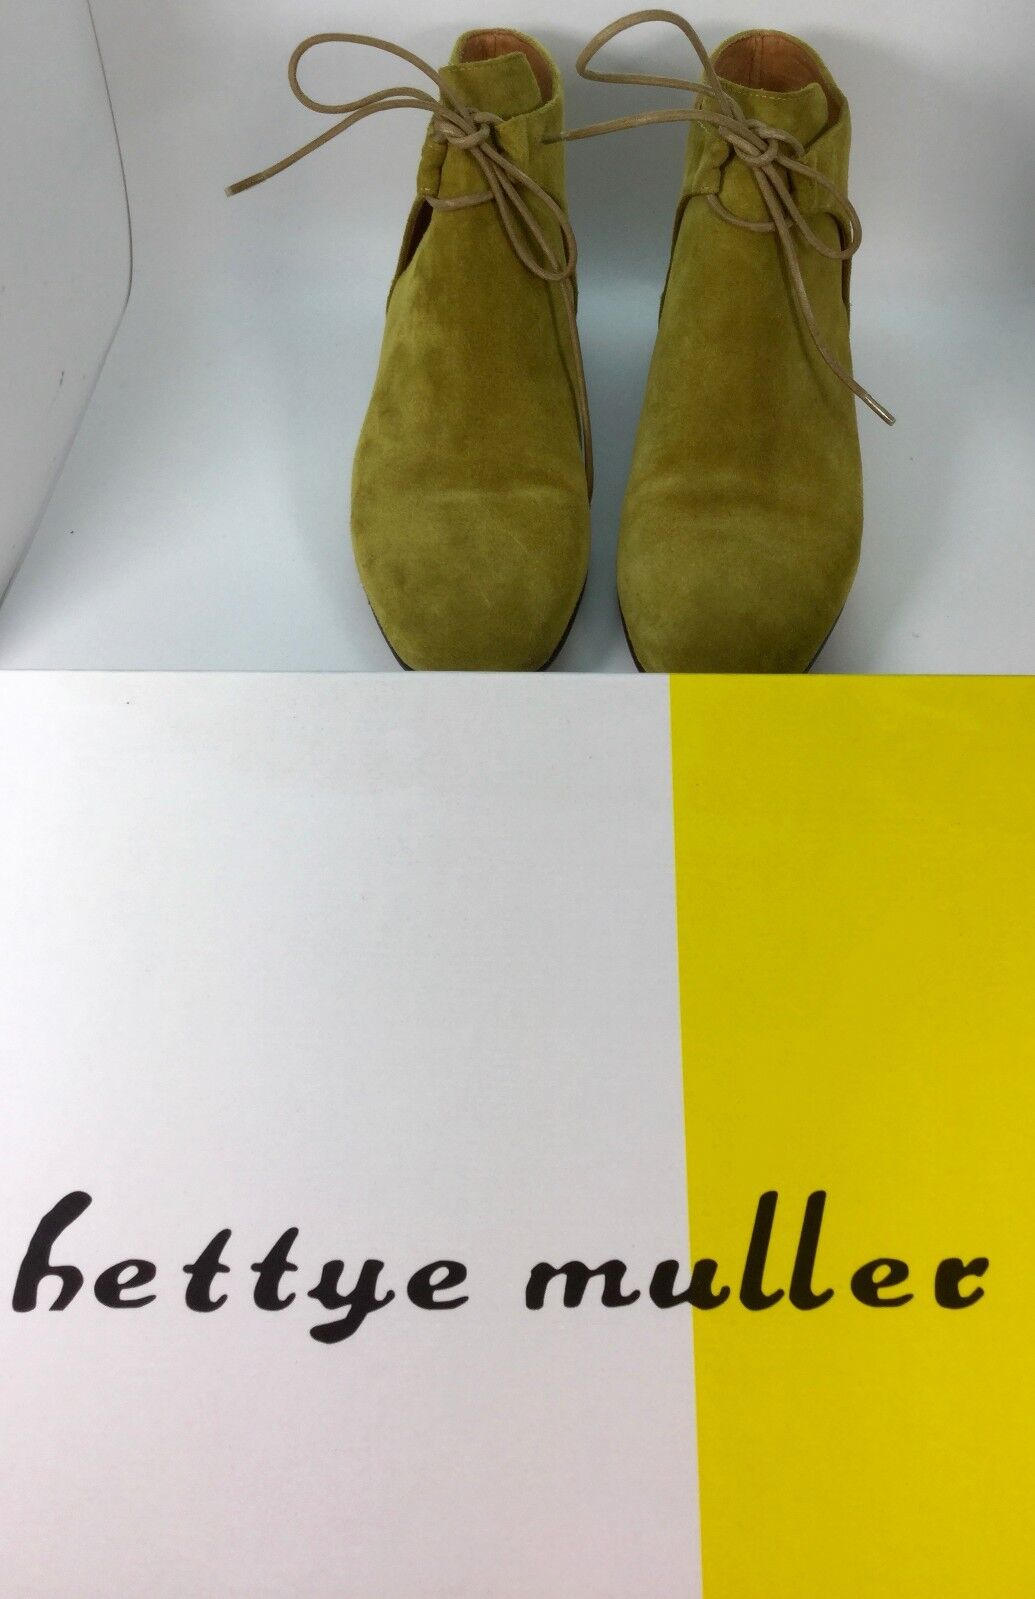 BETTYE MULLER Suede Lace Up Floyd Ankle Bootie Größe 37 395